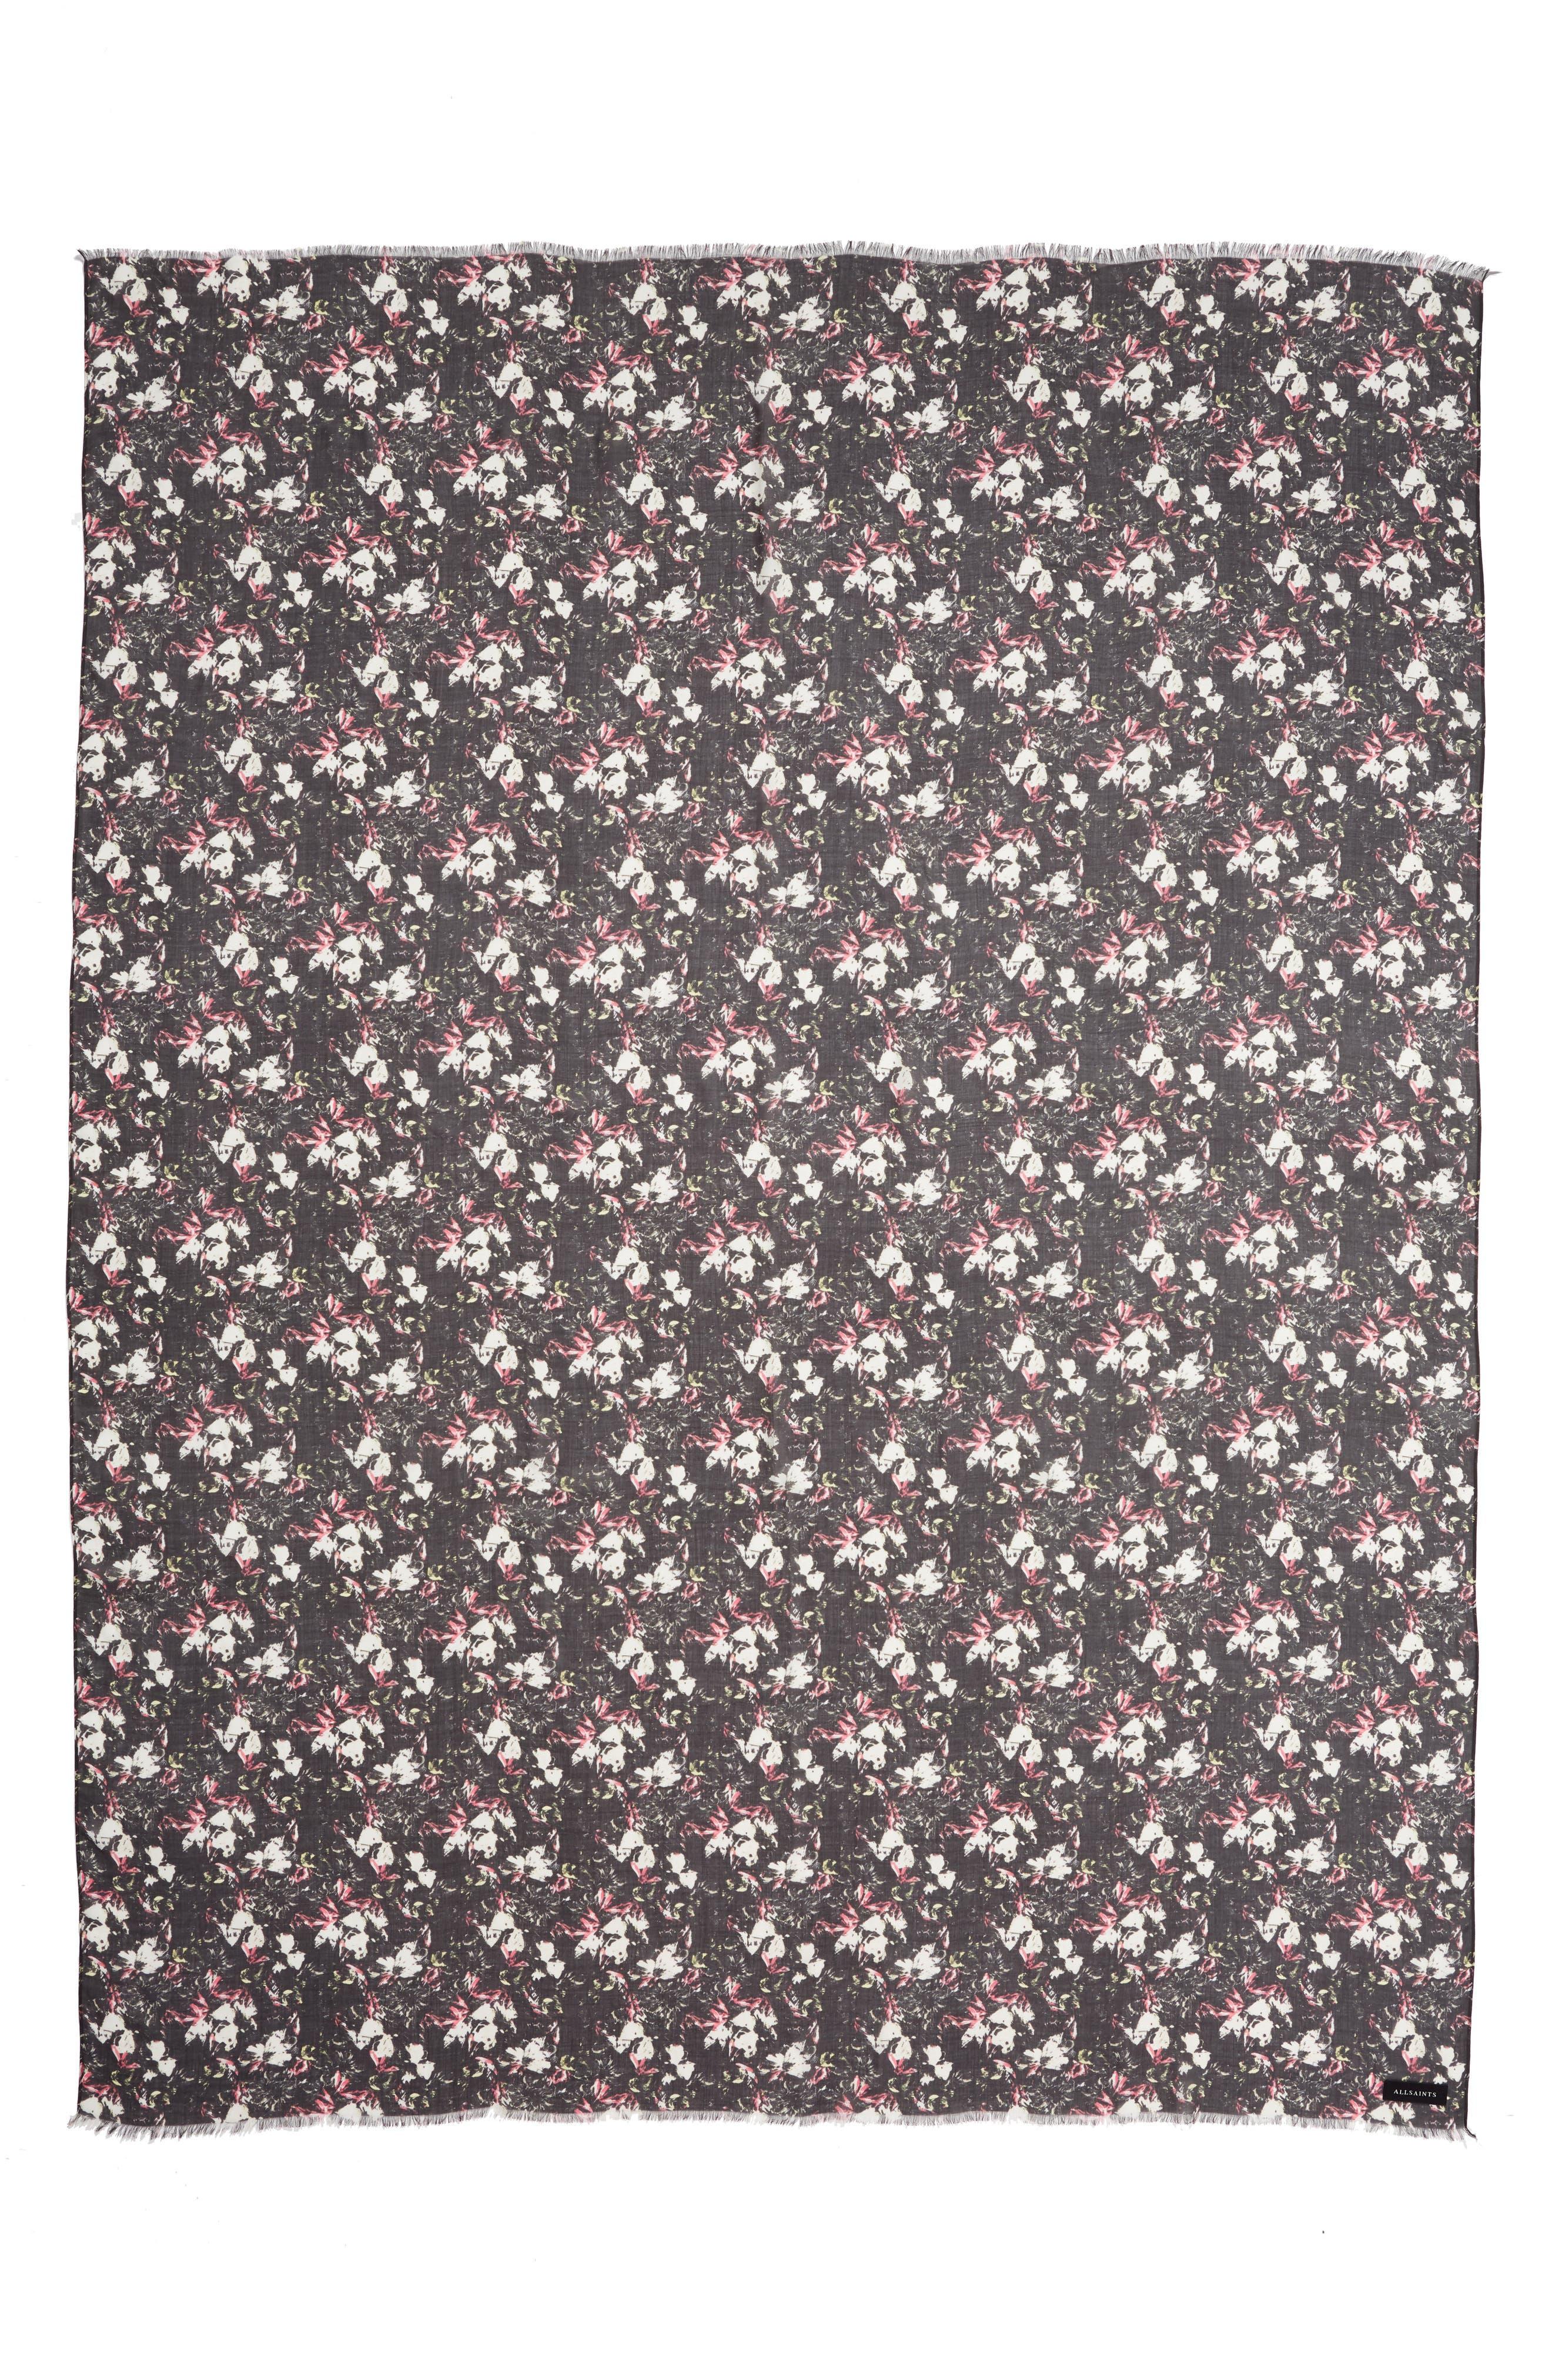 ALLSAINTS, Stella Floral Print Scarf, Alternate thumbnail 3, color, BLACK